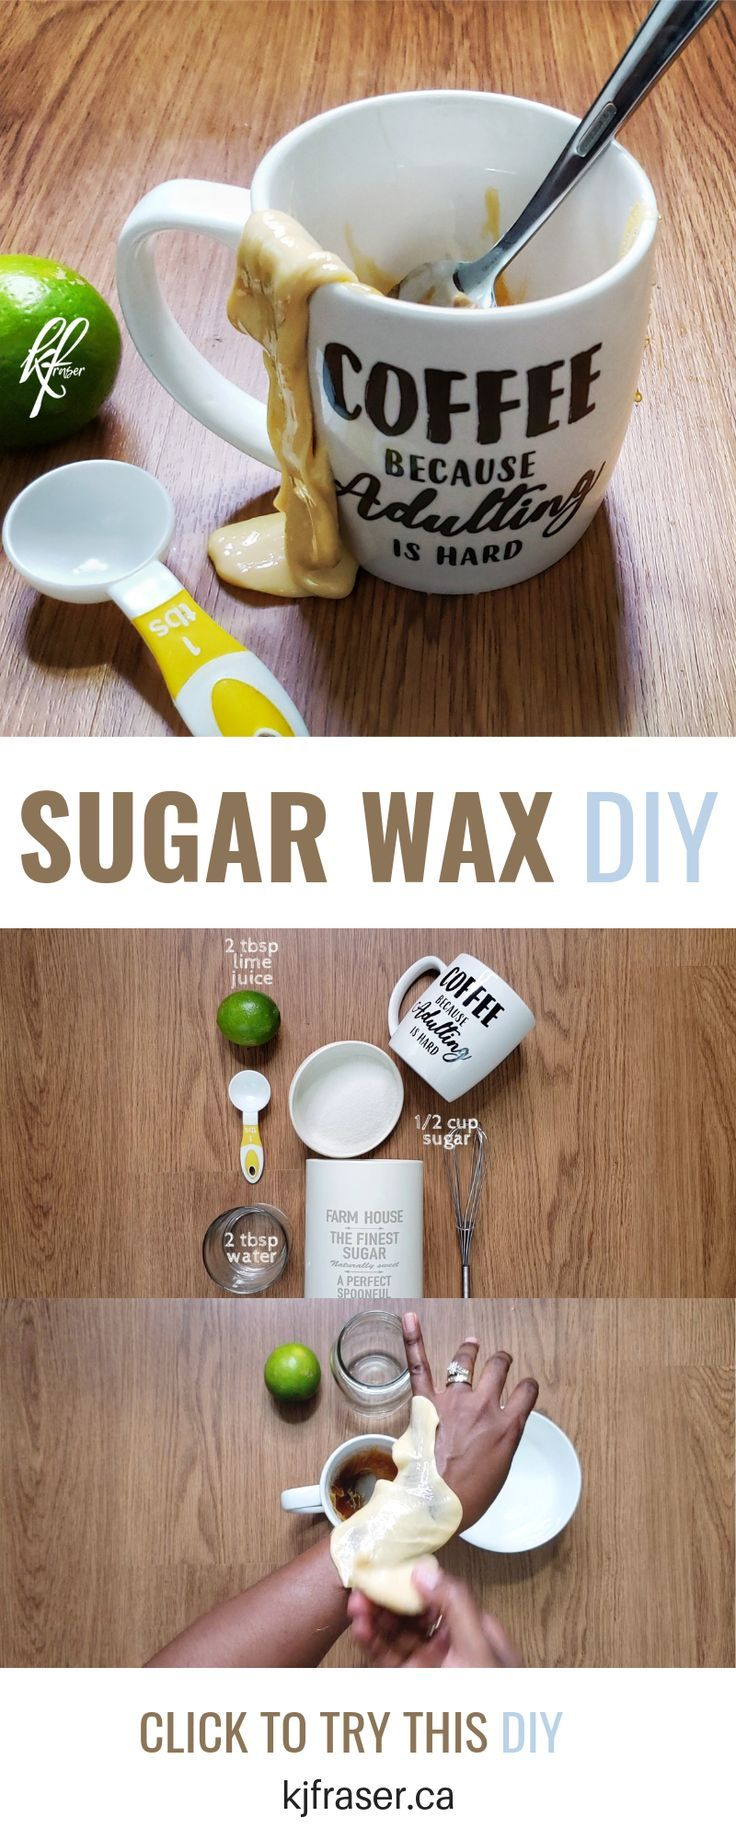 How to Make Sugar Wax Sugar Waxing for Beginners Sugar